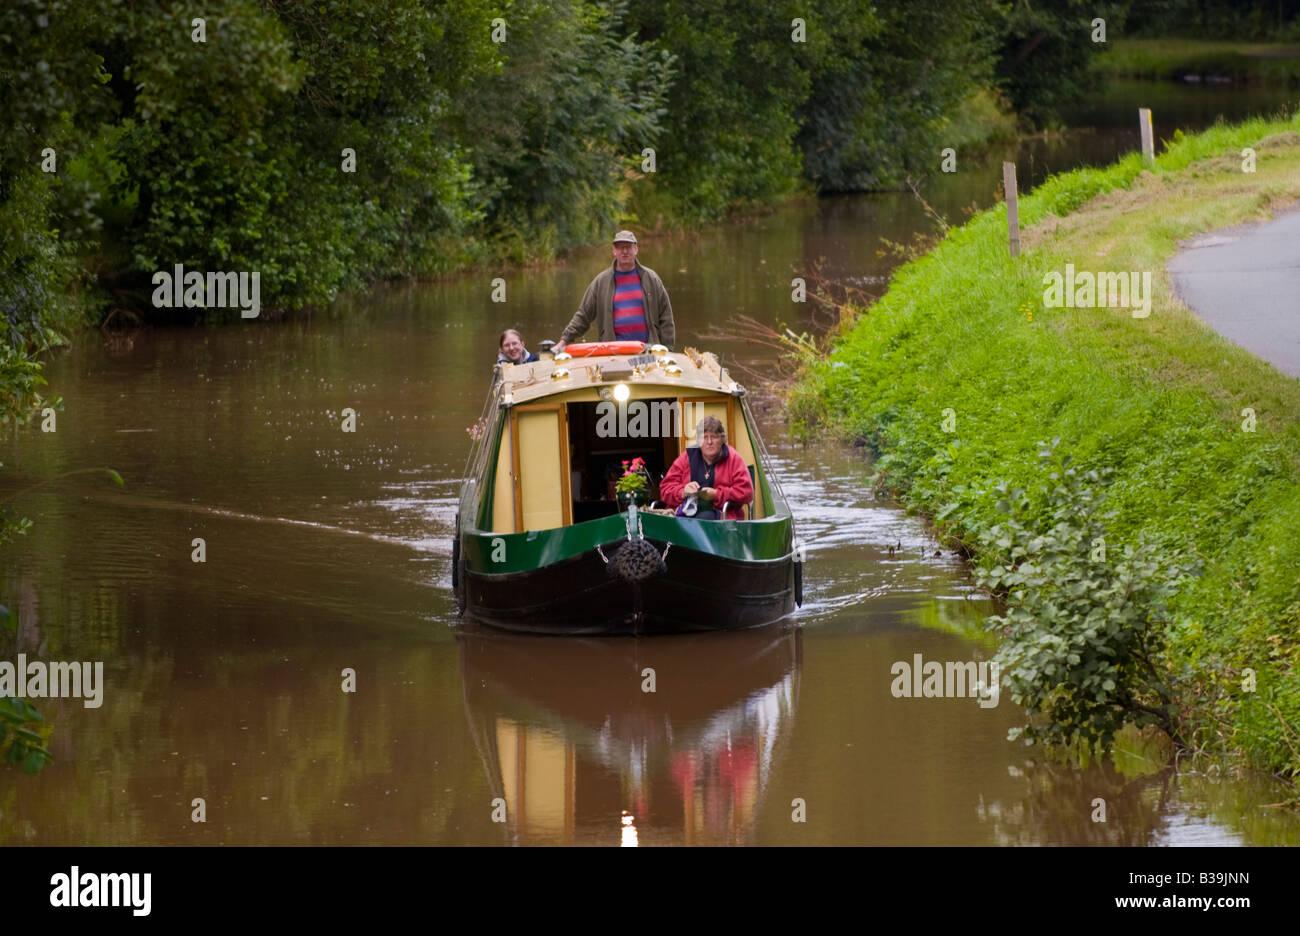 Canal Tours Near London Uk